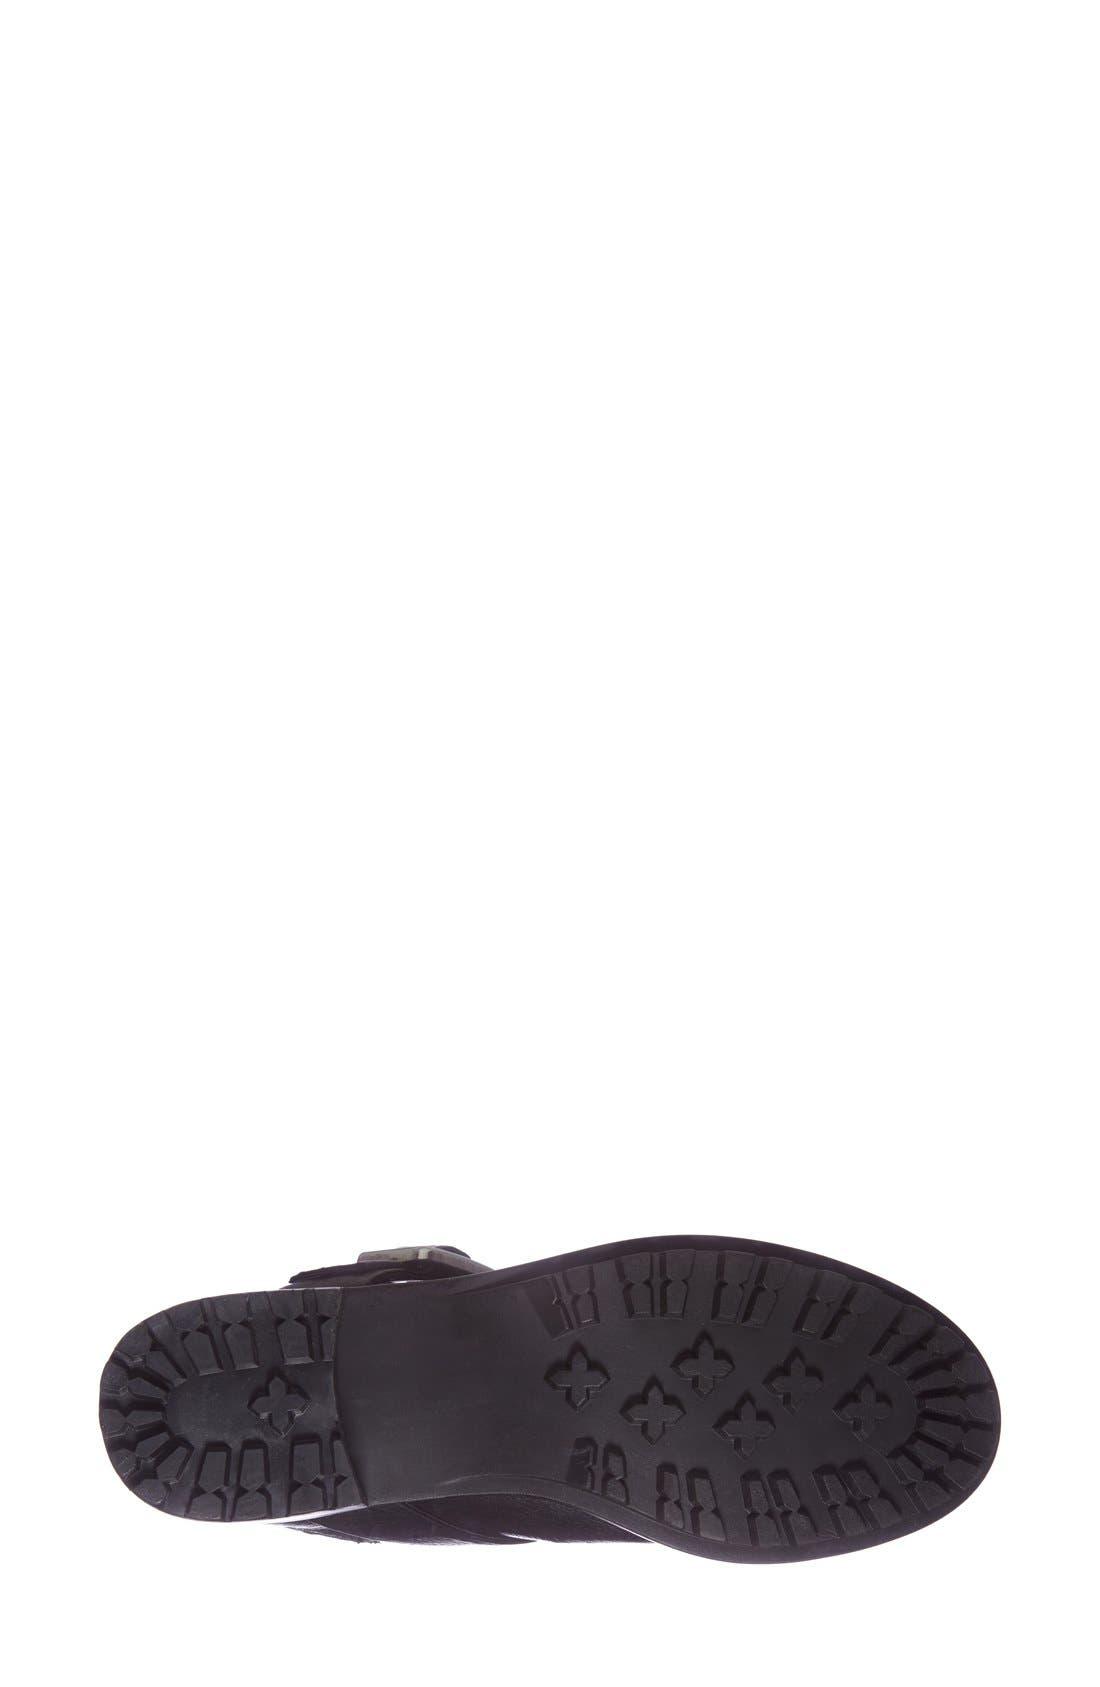 Alternate Image 4  - Steve Madden 'Rivalree' Moto Boot (Women) (Special Purchase)